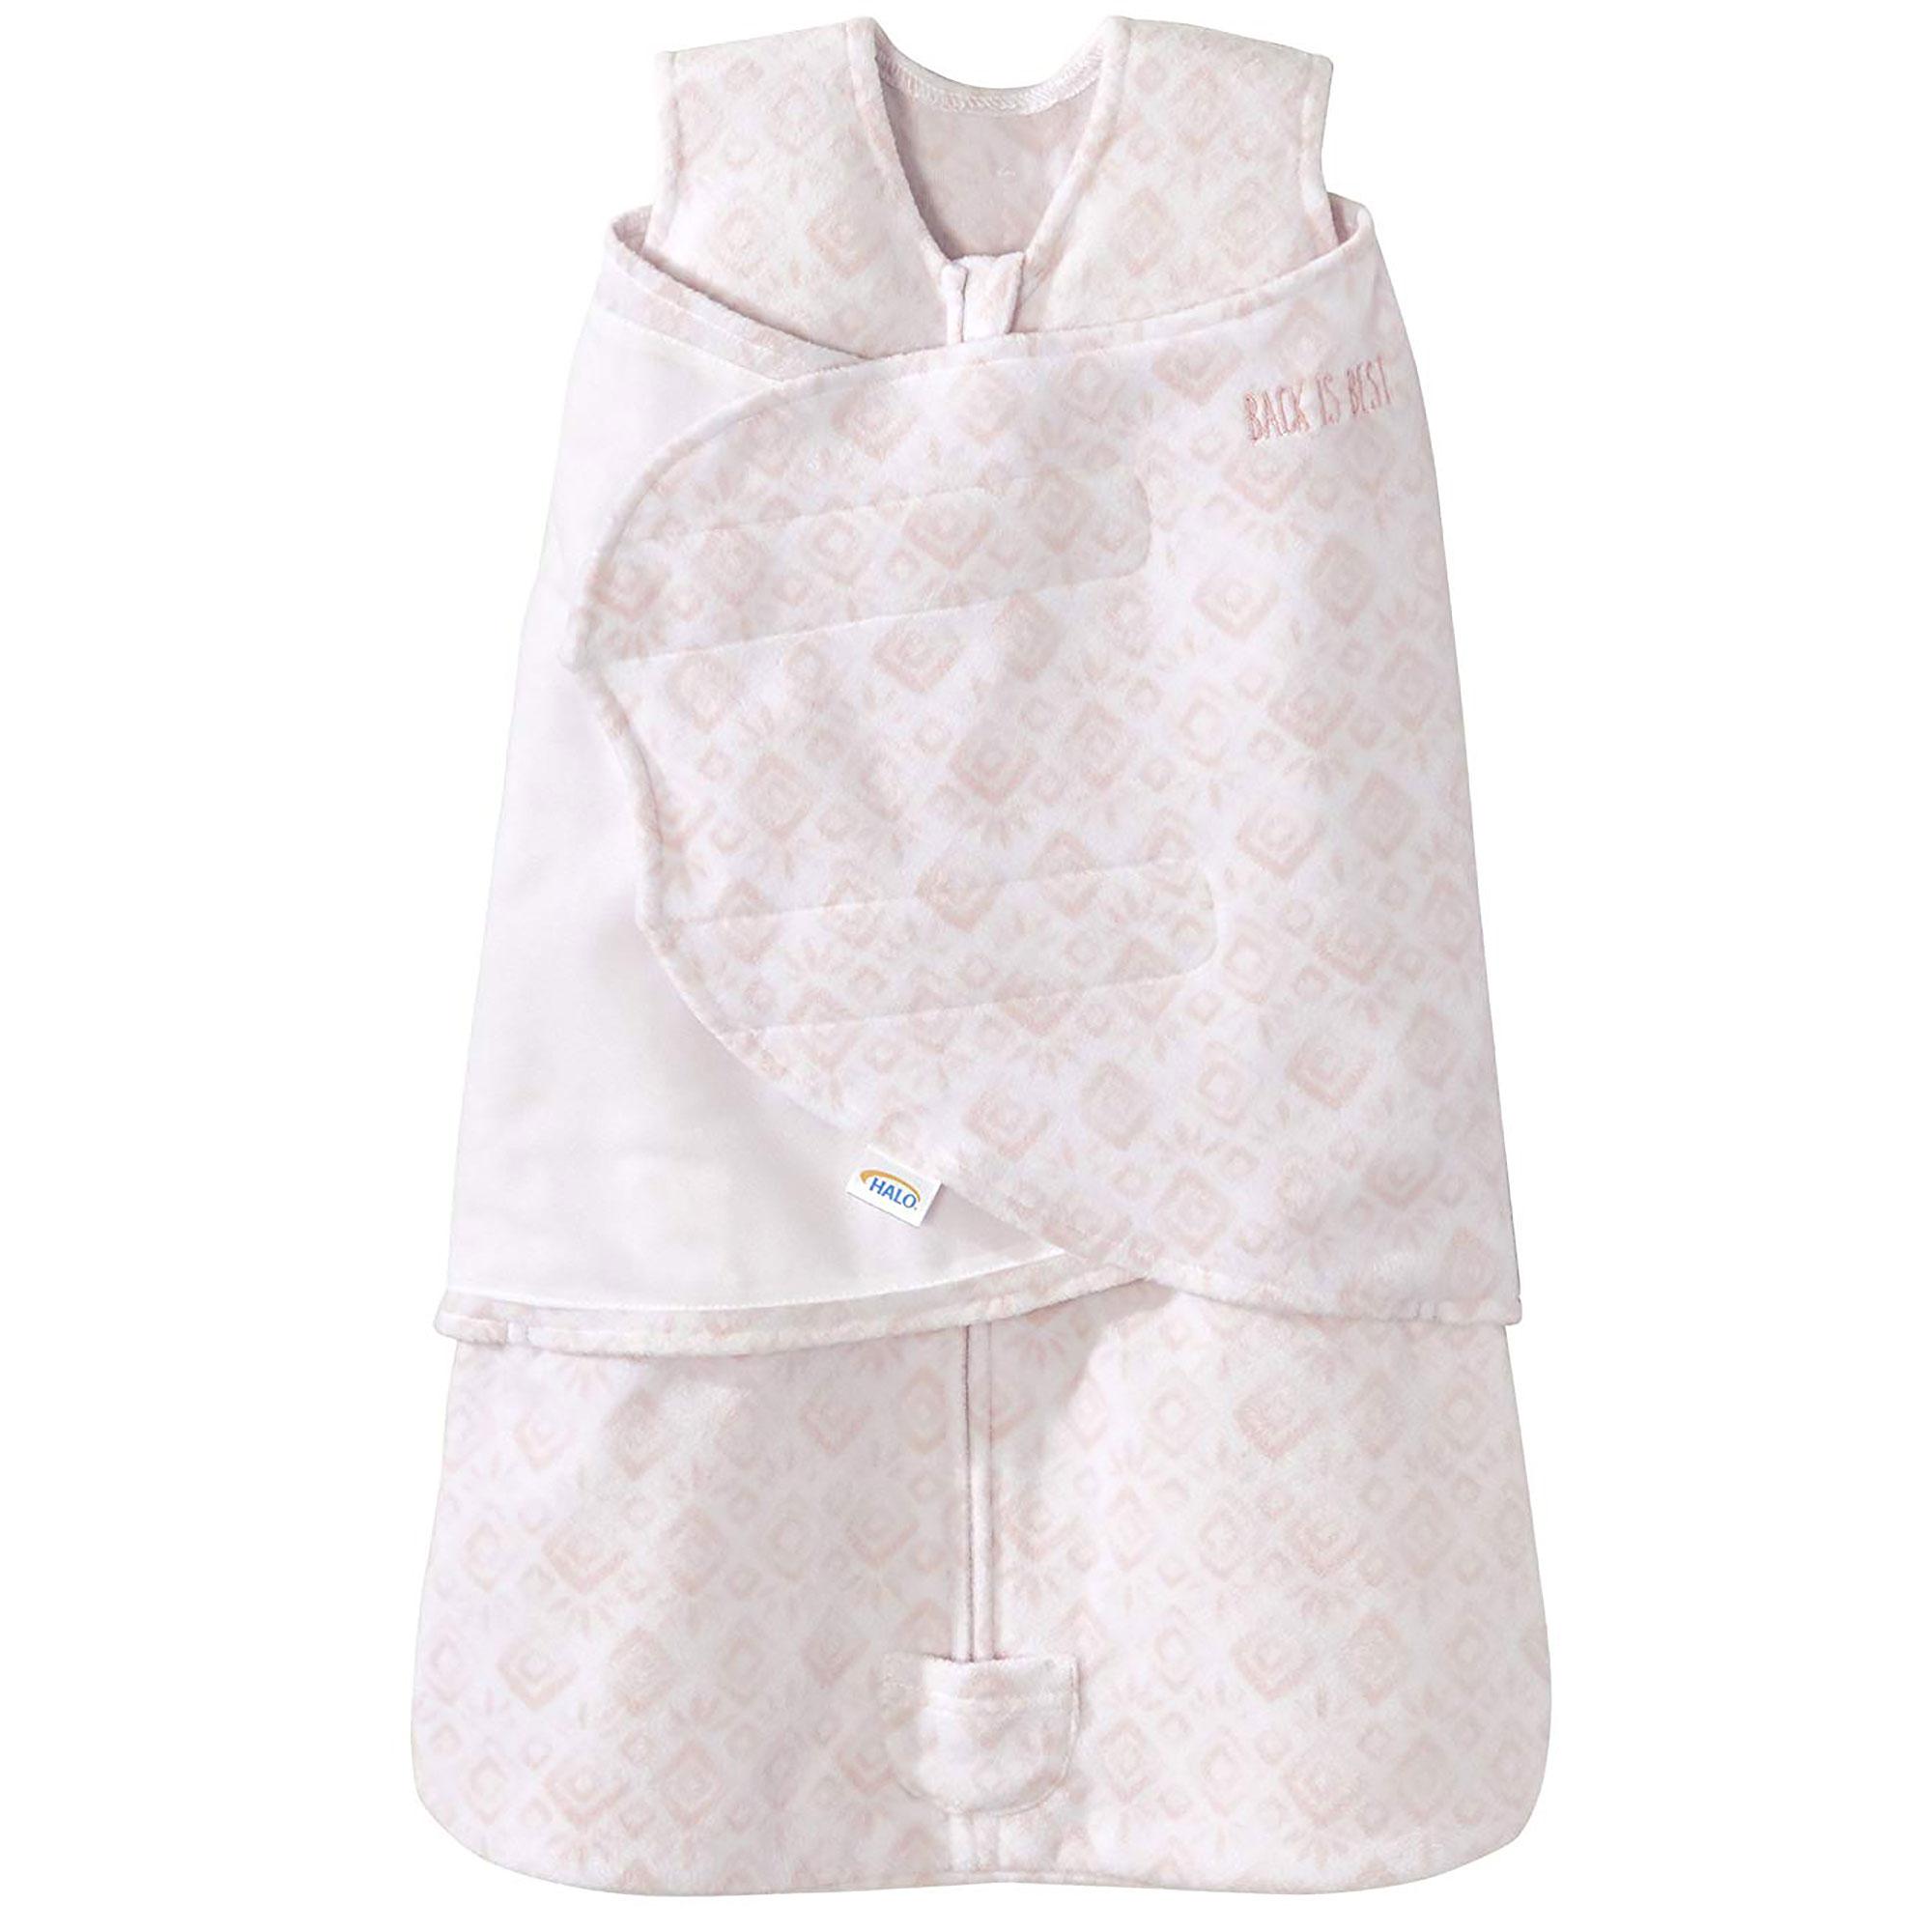 6cbd40fd89 Details about Halo Micro Fleece SleepSack Swaddle Wearable Blanket